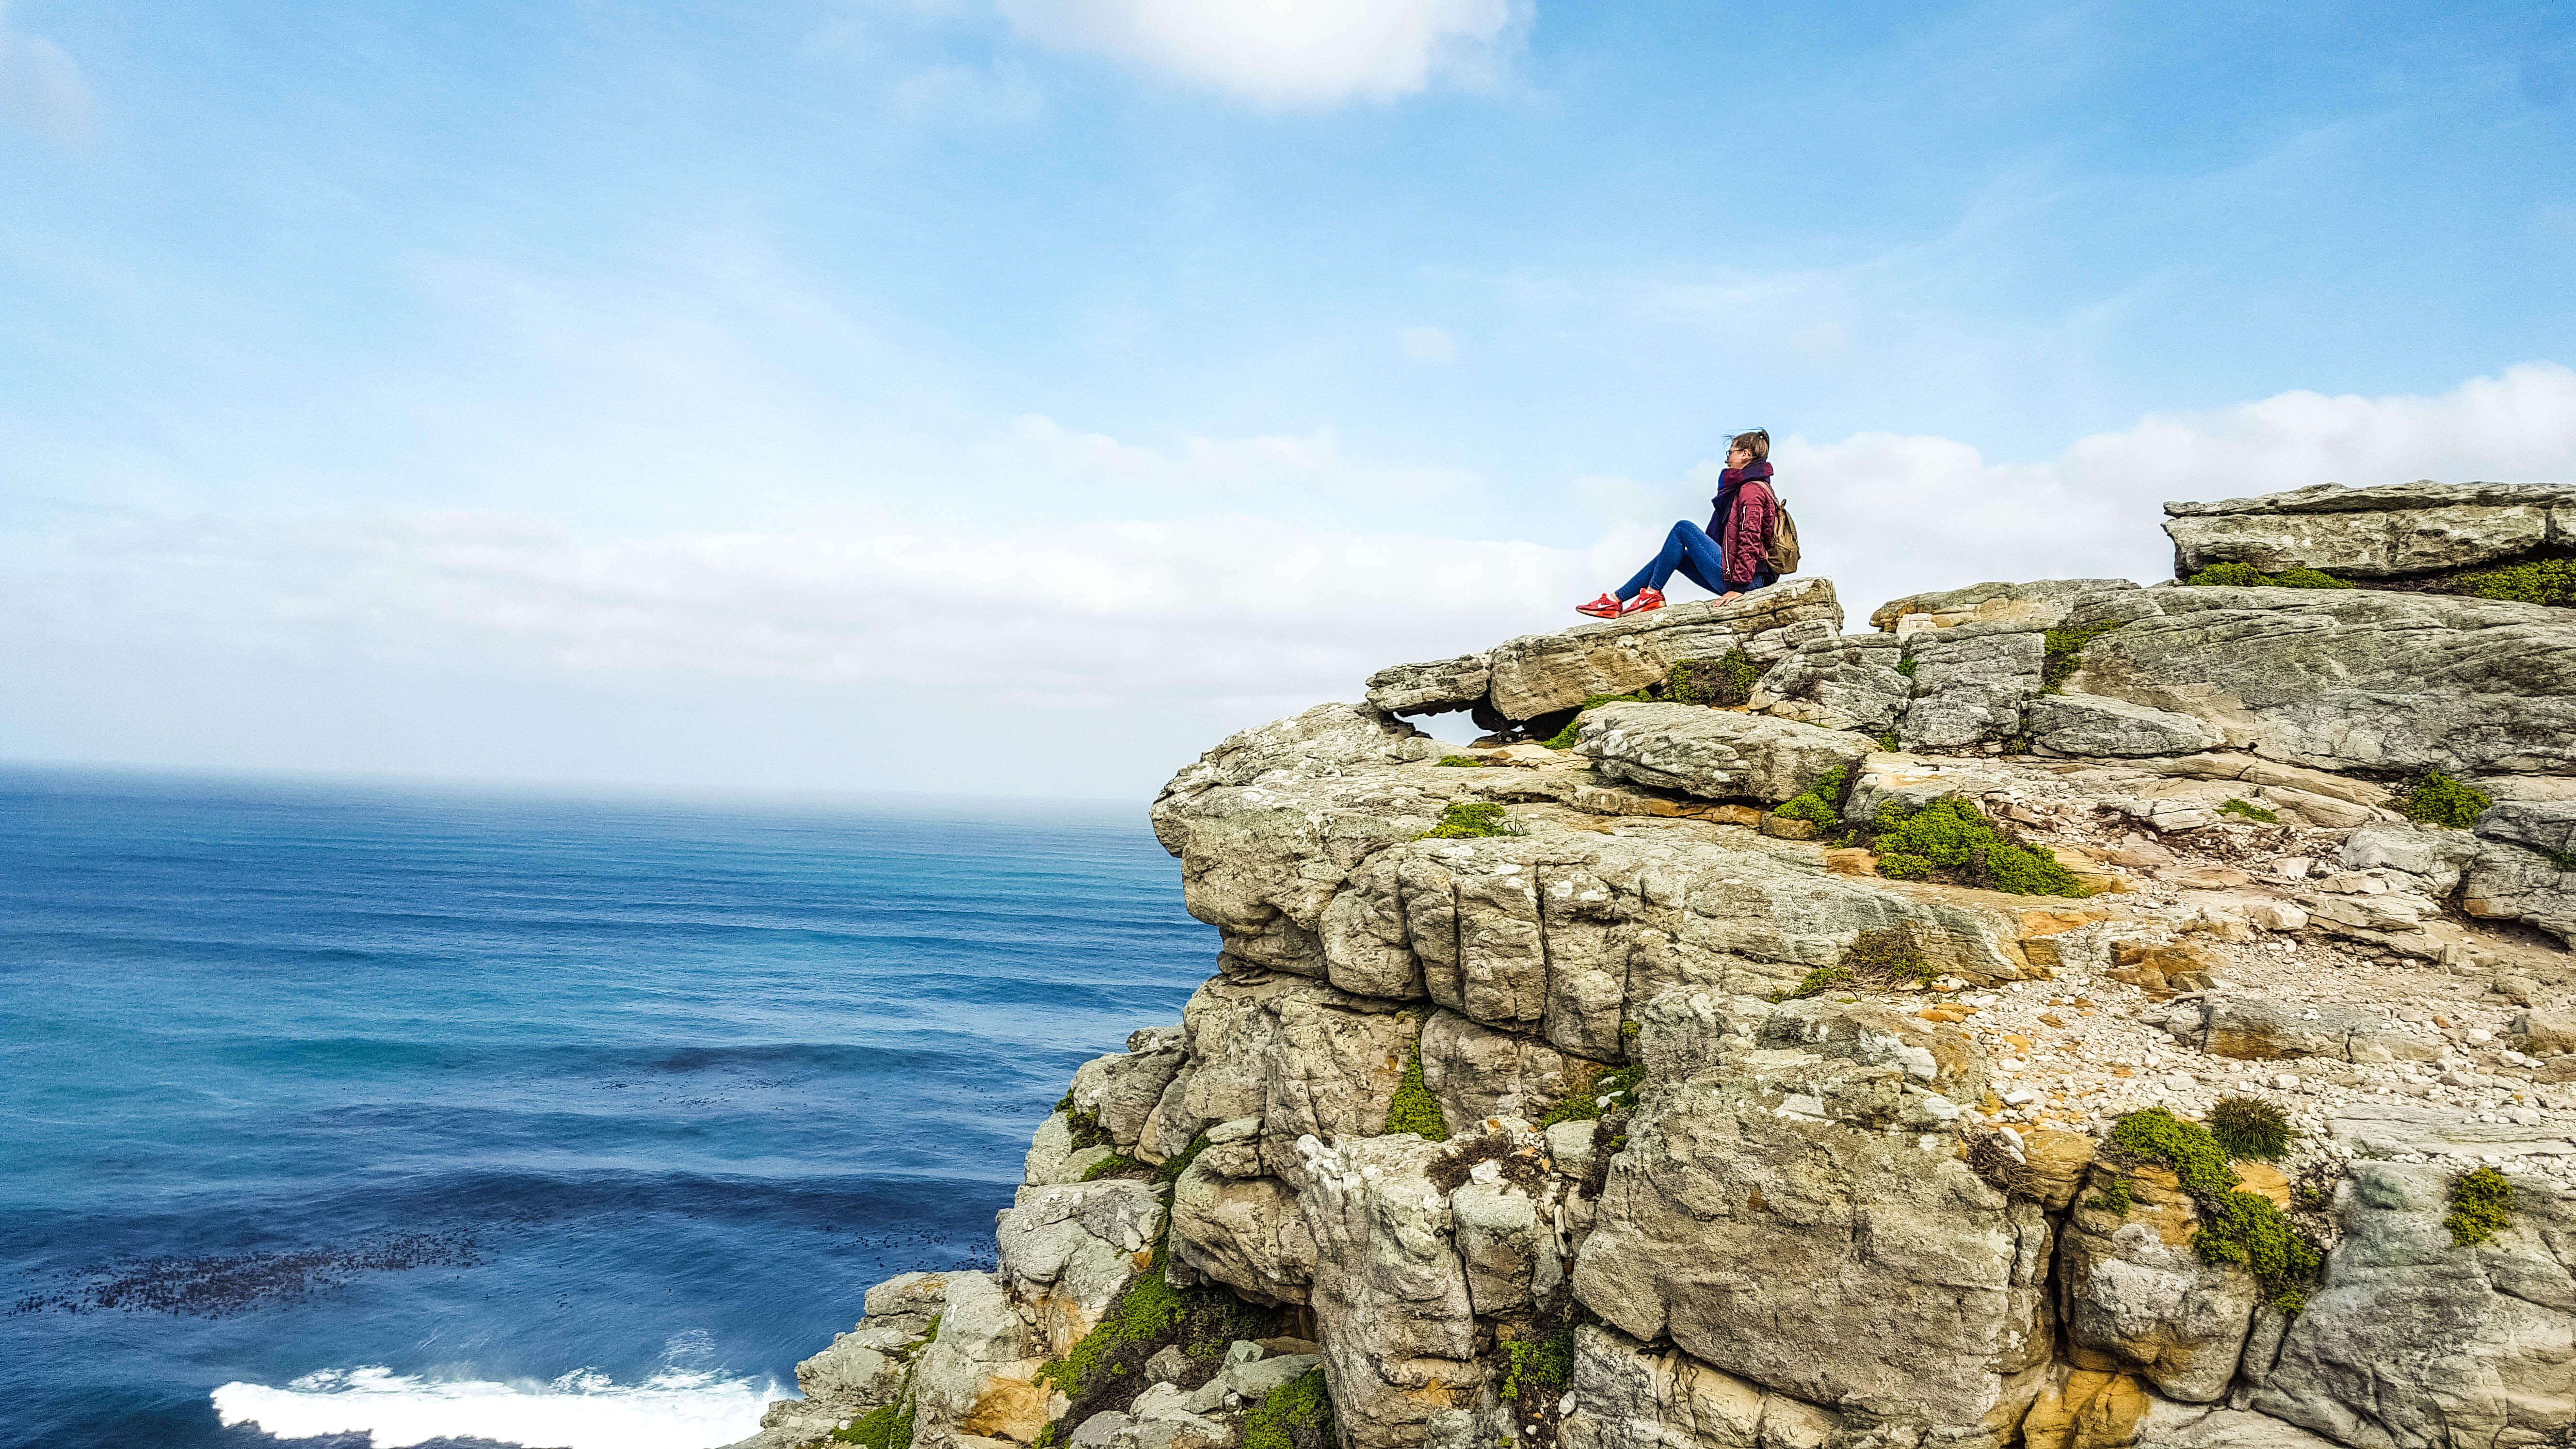 vipassana meditation erfahrungsbericht